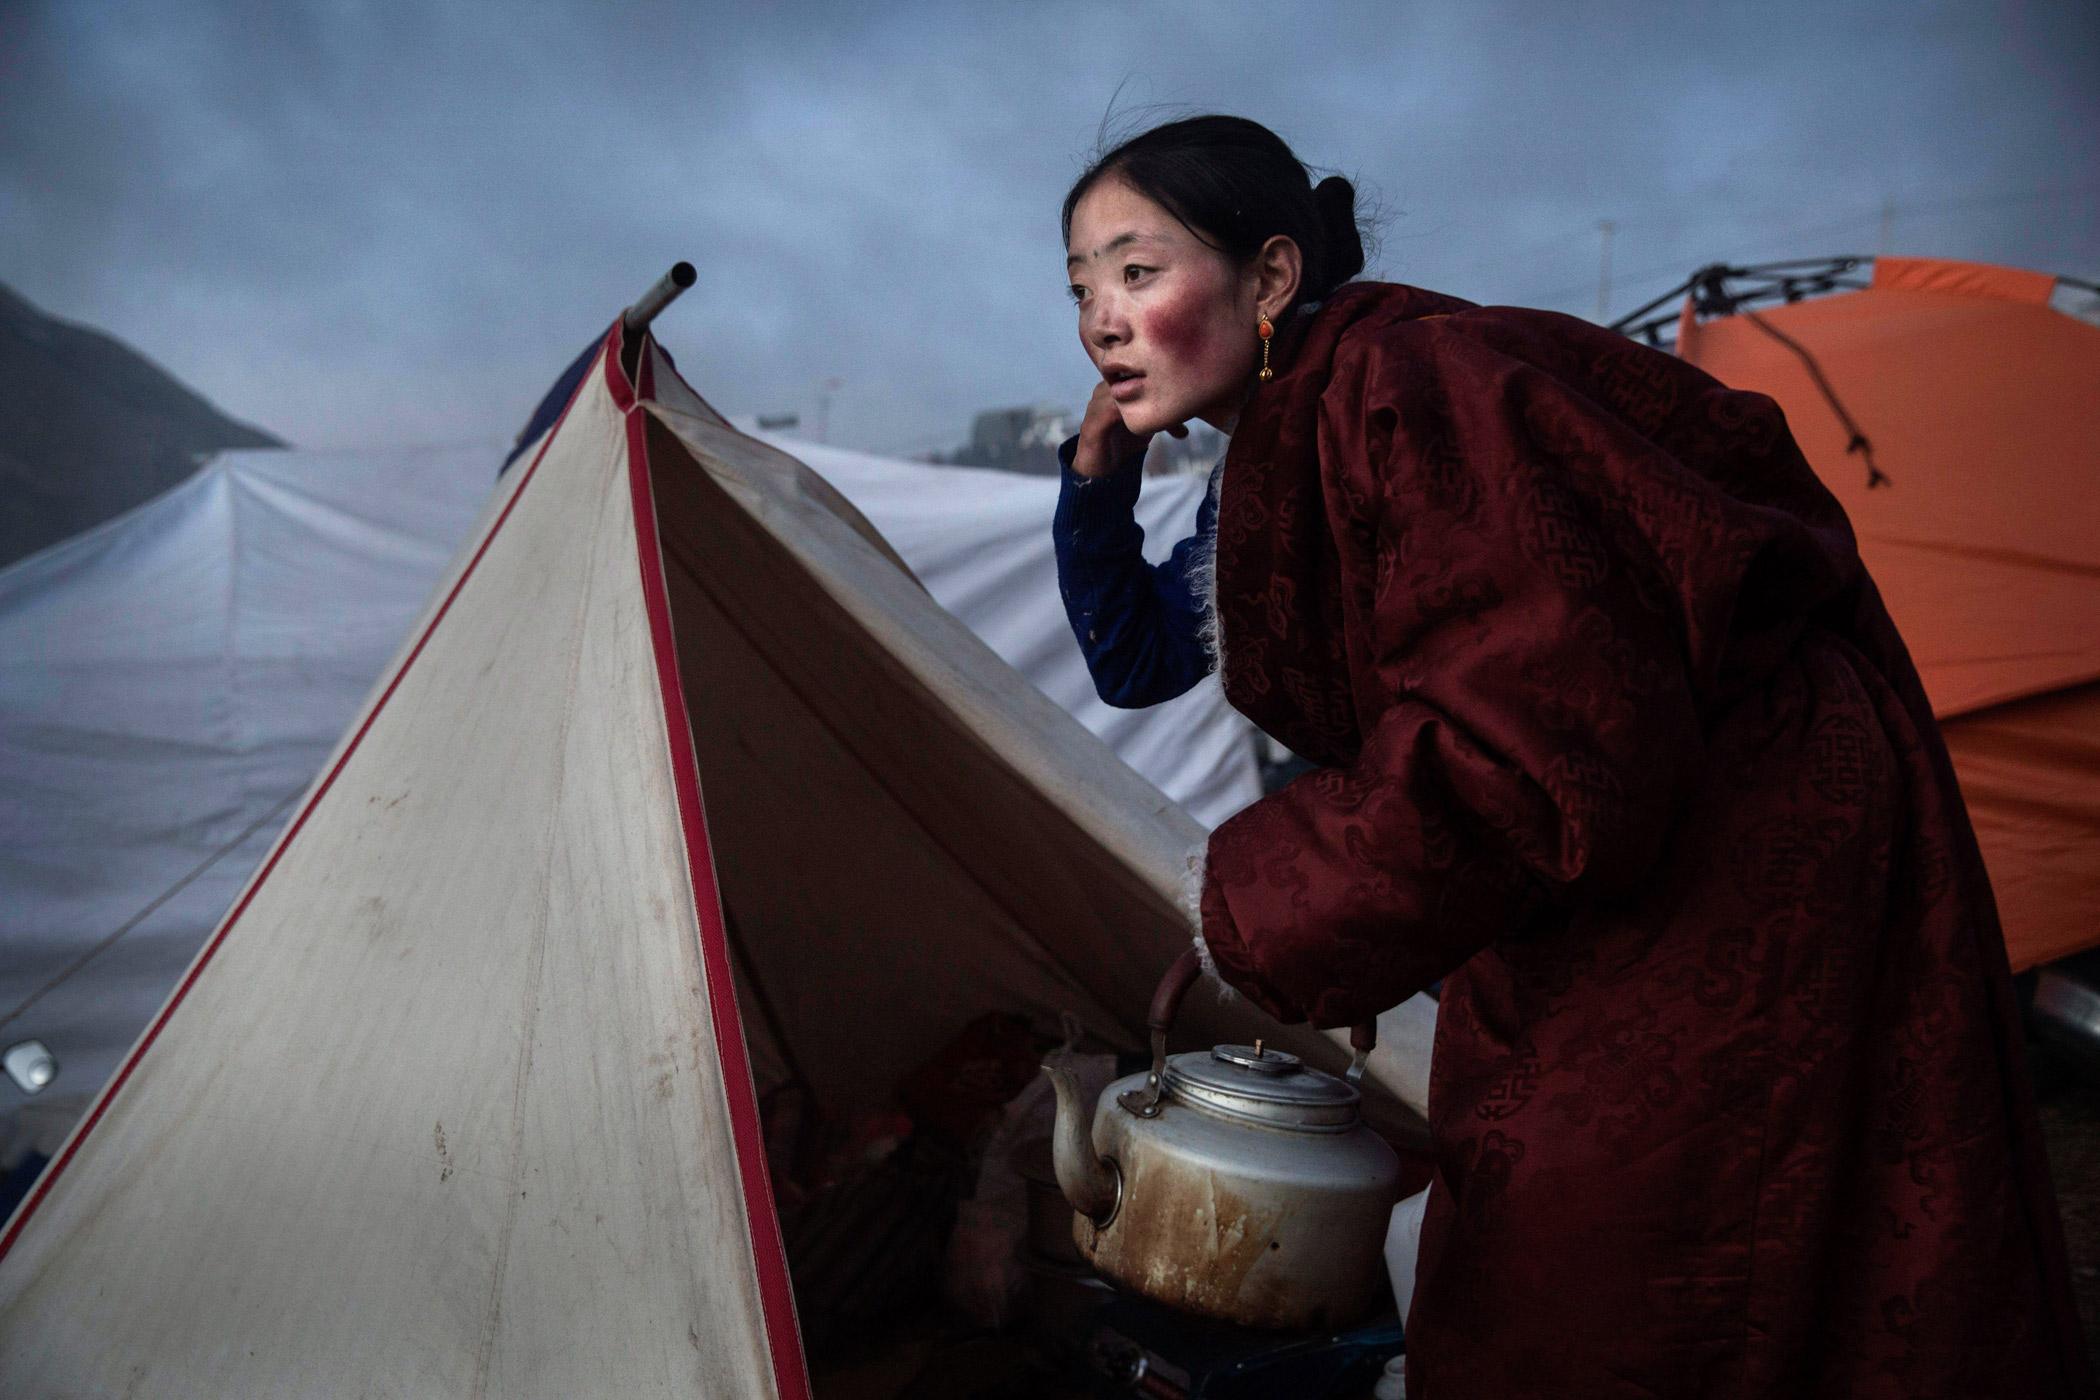 A Tibetan Buddhist nomad woman prepares tea at dusk following a chanting session.